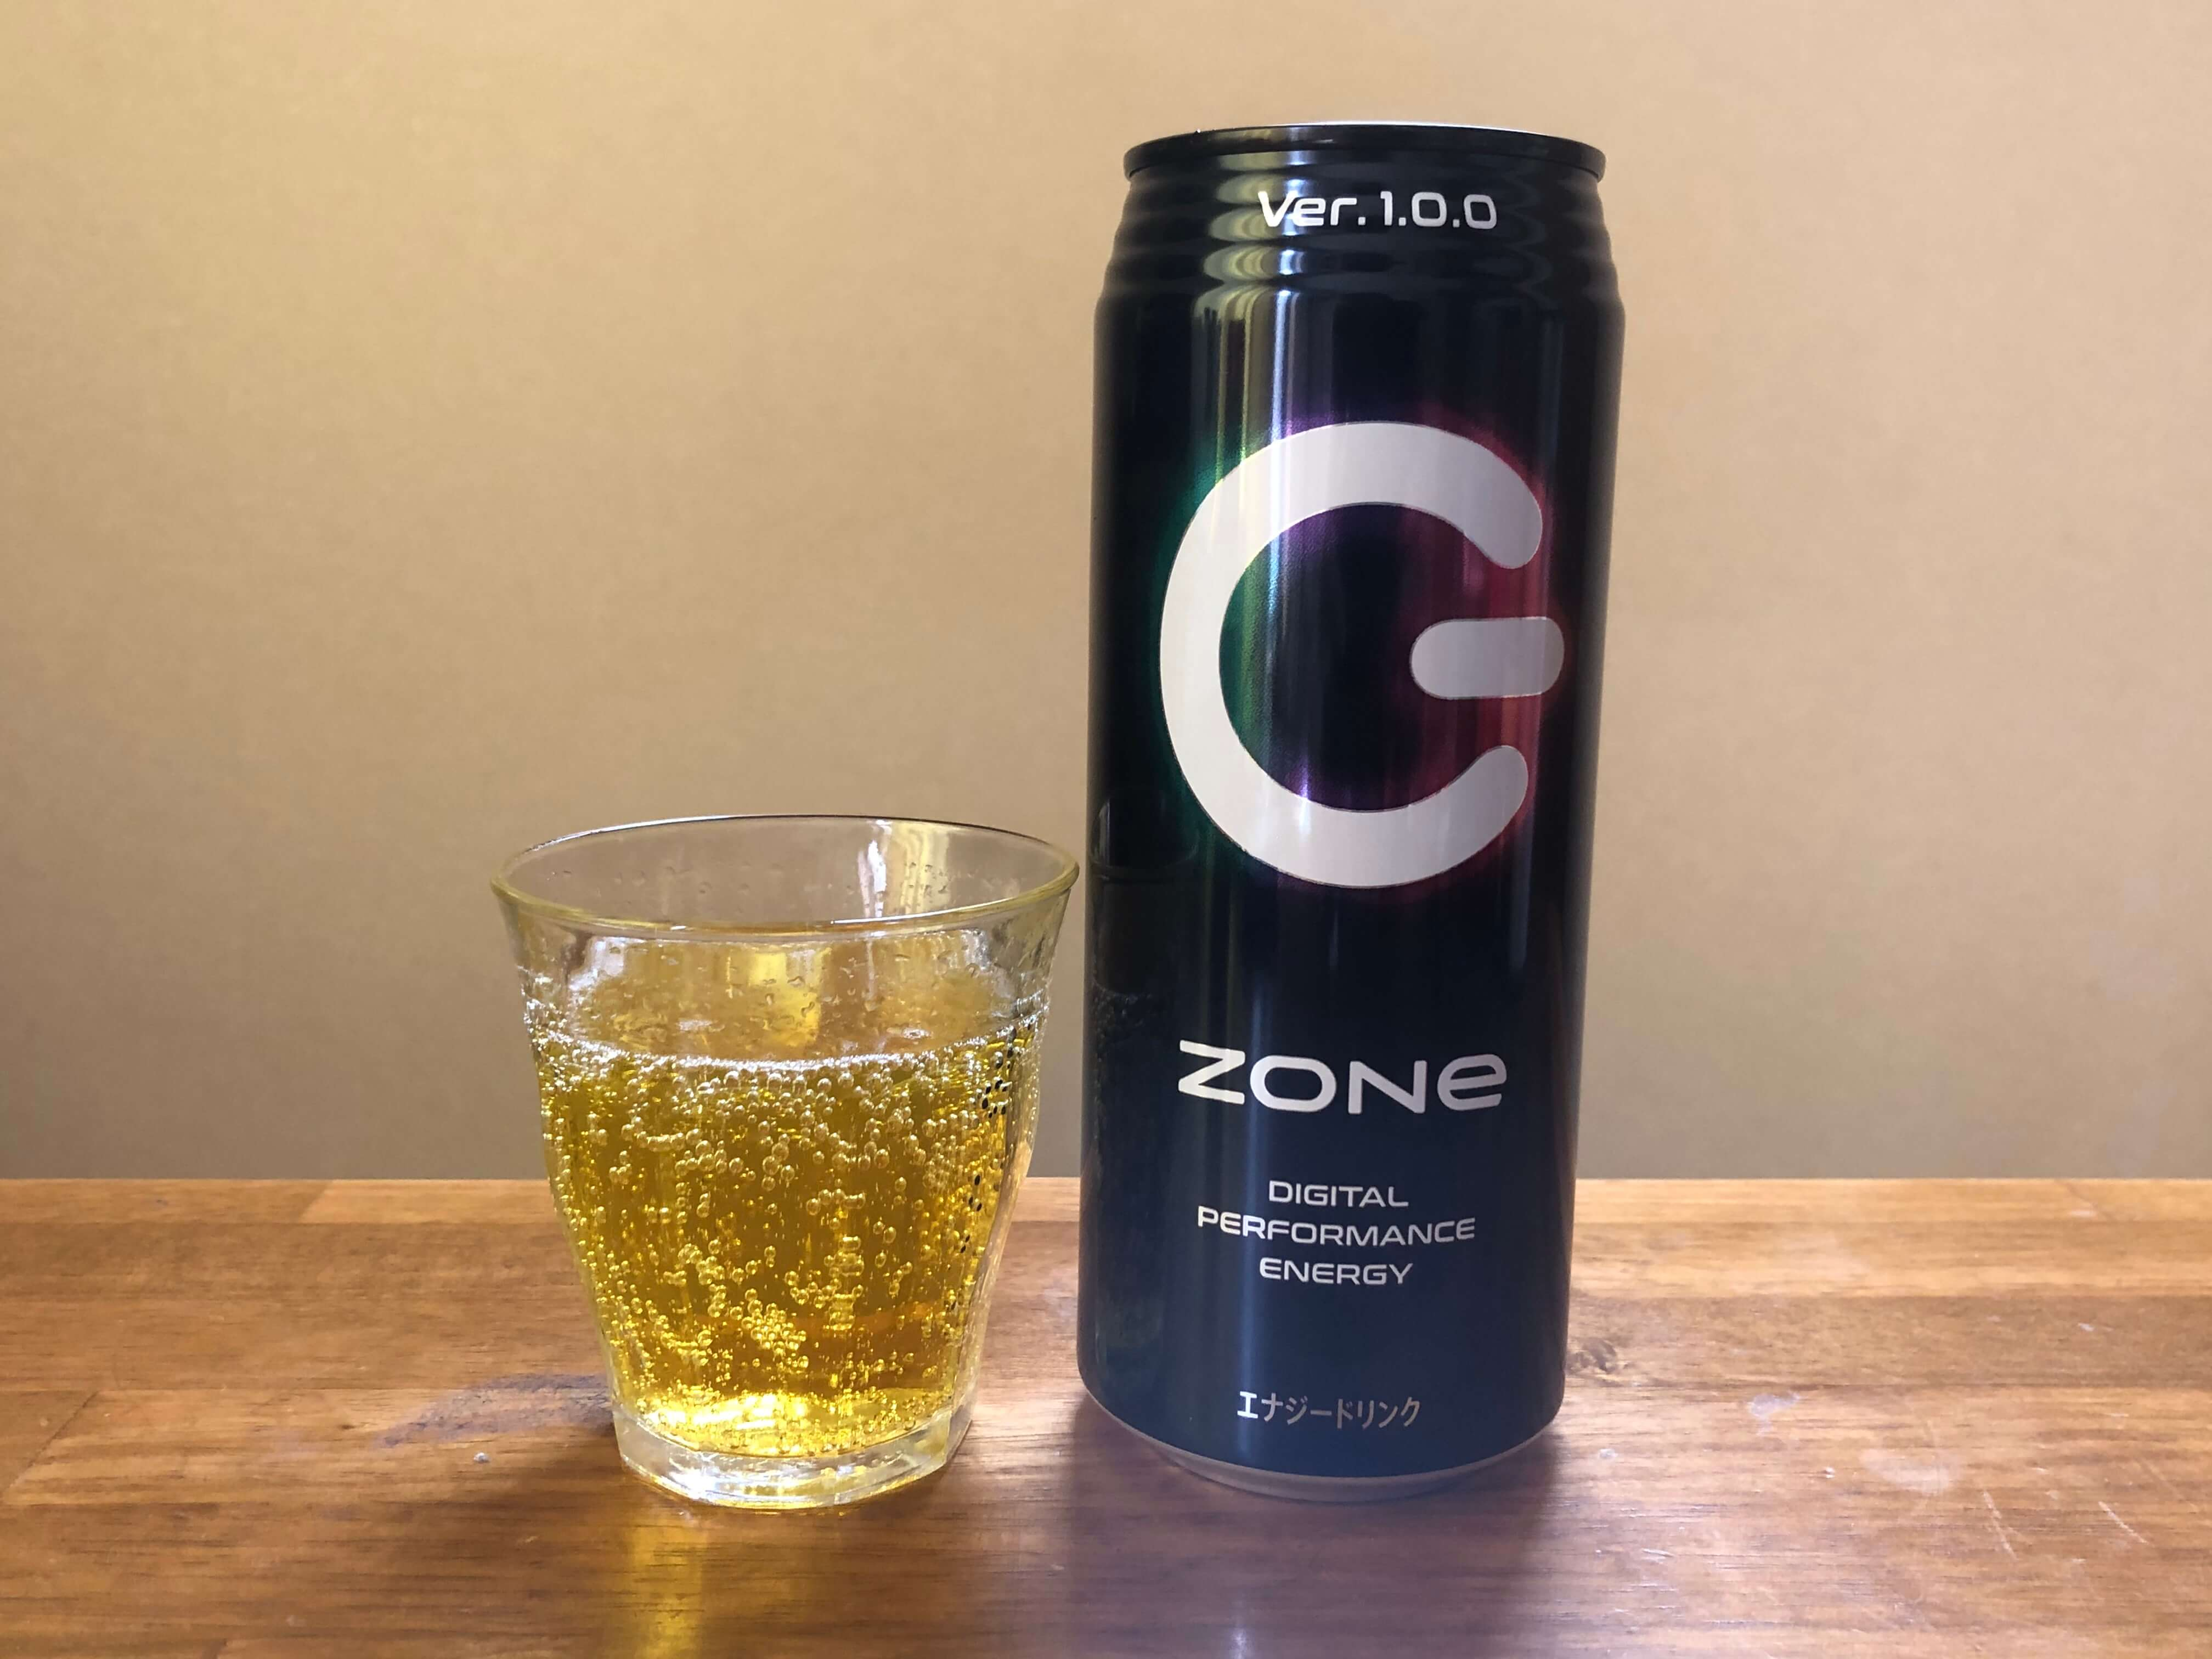 ZONeエナジードリンクの色味